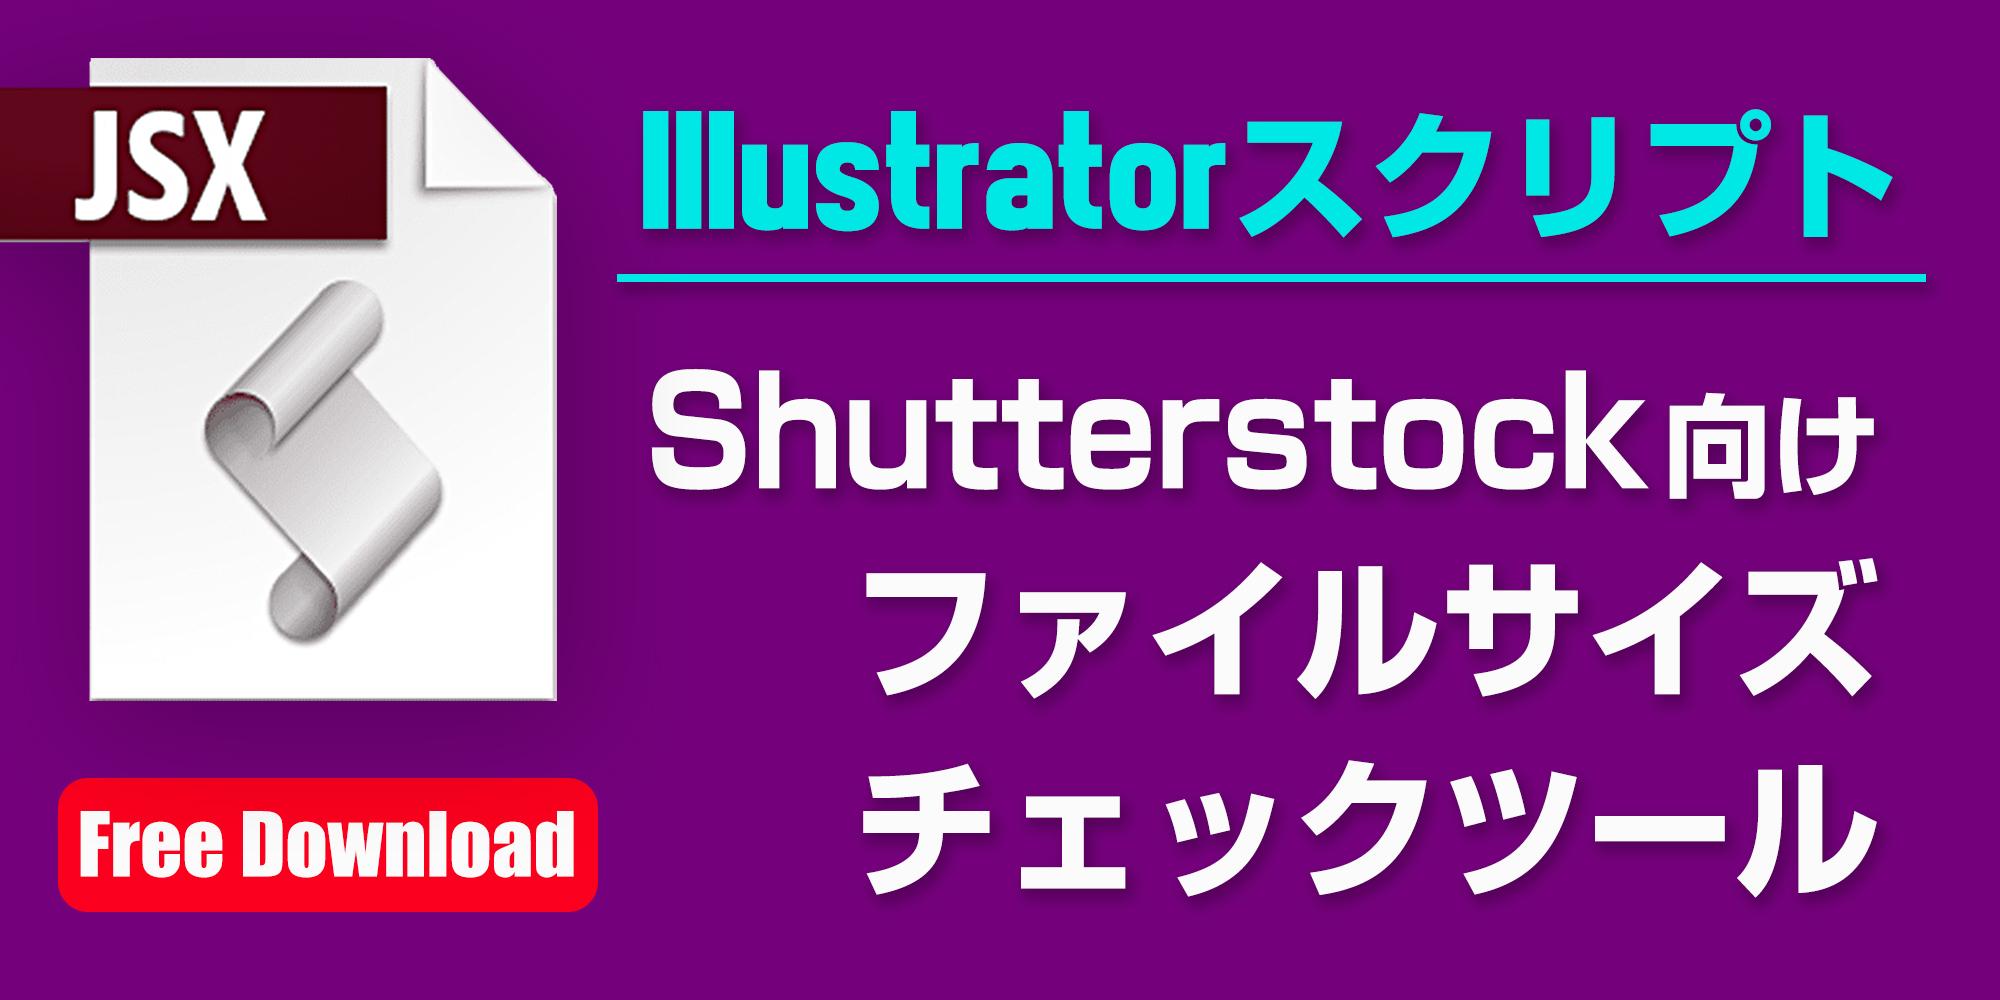 Illustratorスクリプト(shutterstock向け)